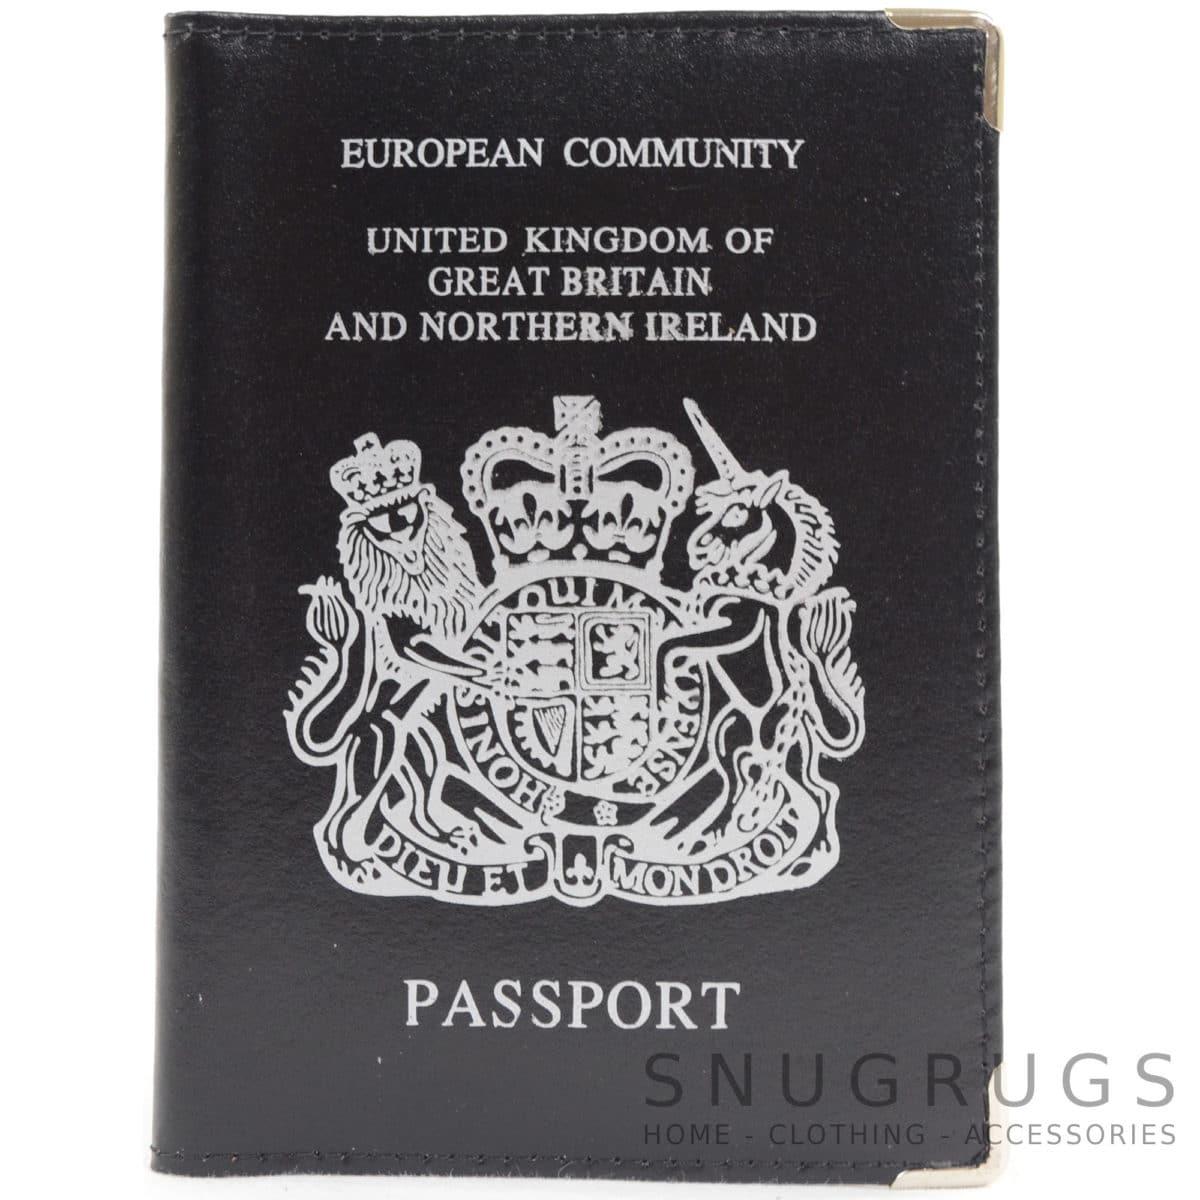 Leather Passport Holder / Case - Black